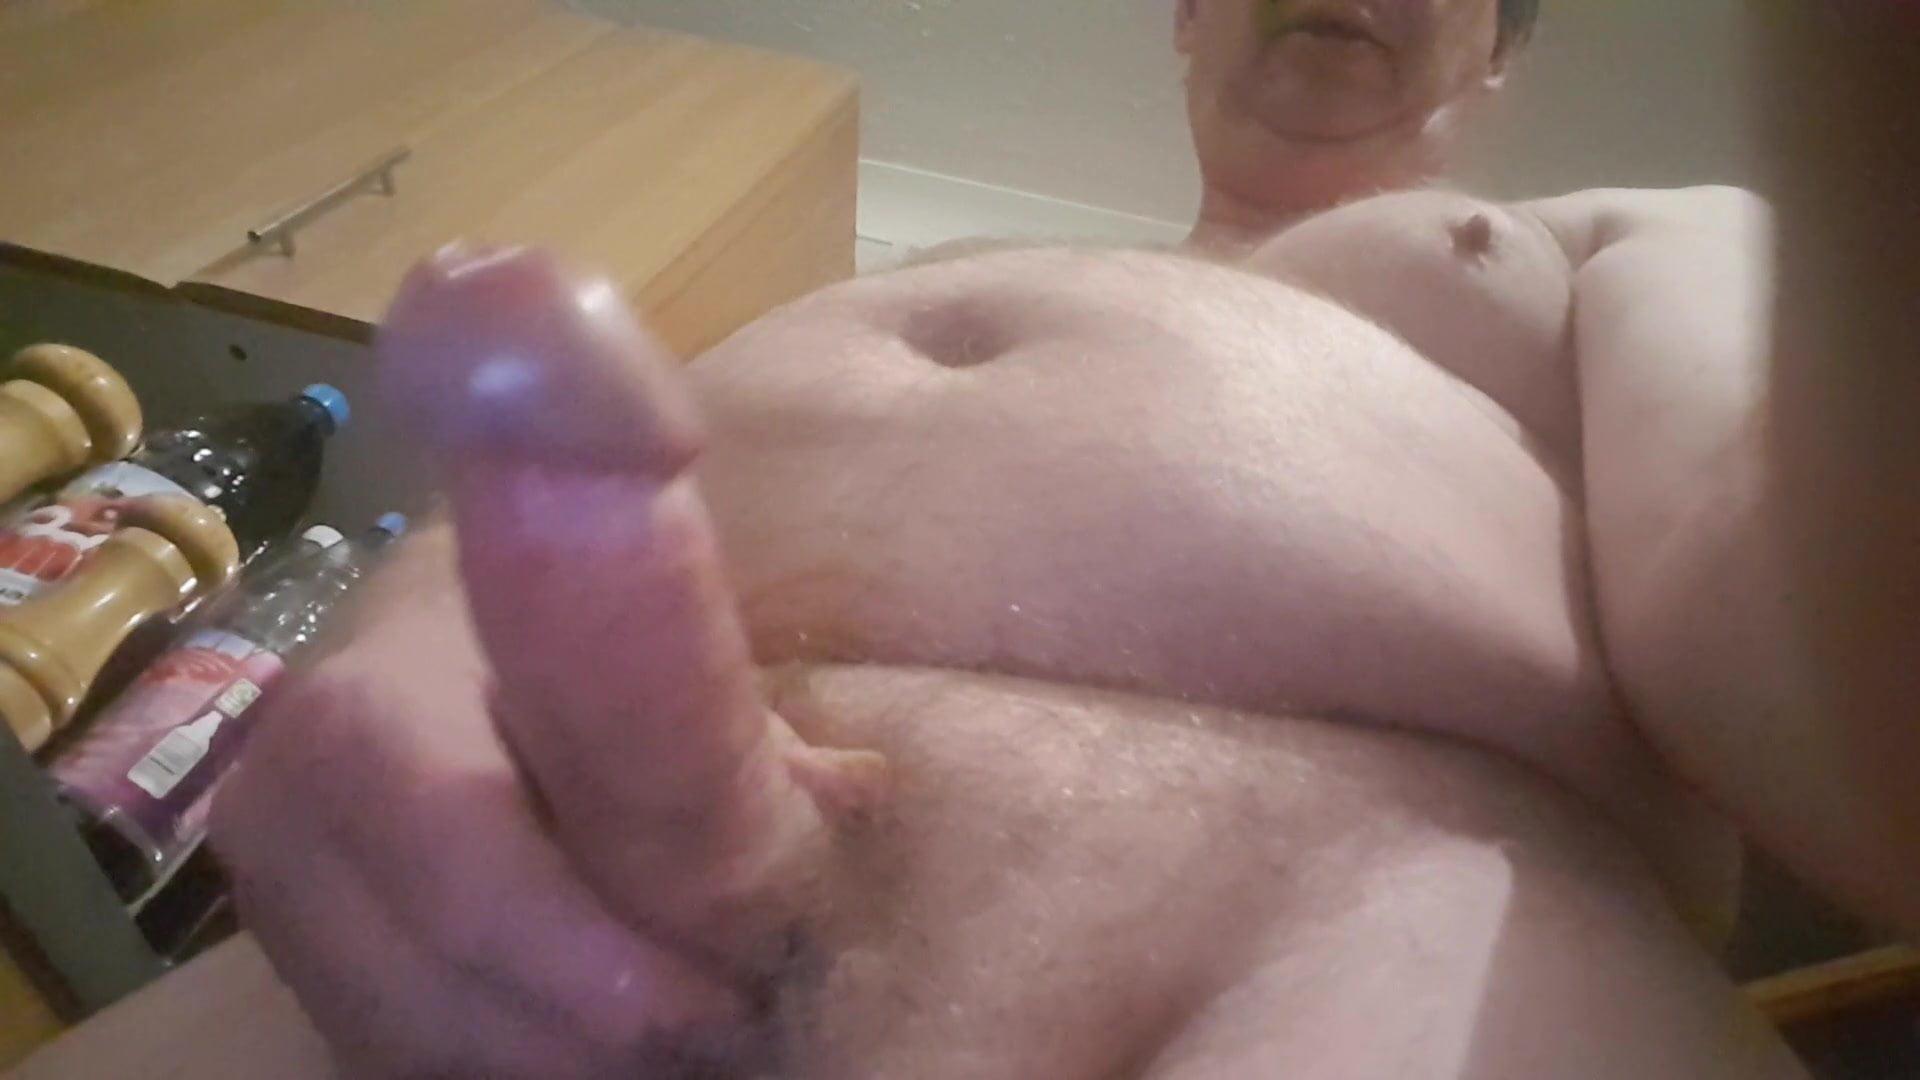 Nicolly Dickman Porno dickman & robin der schoko fick - big natural tits, close-up